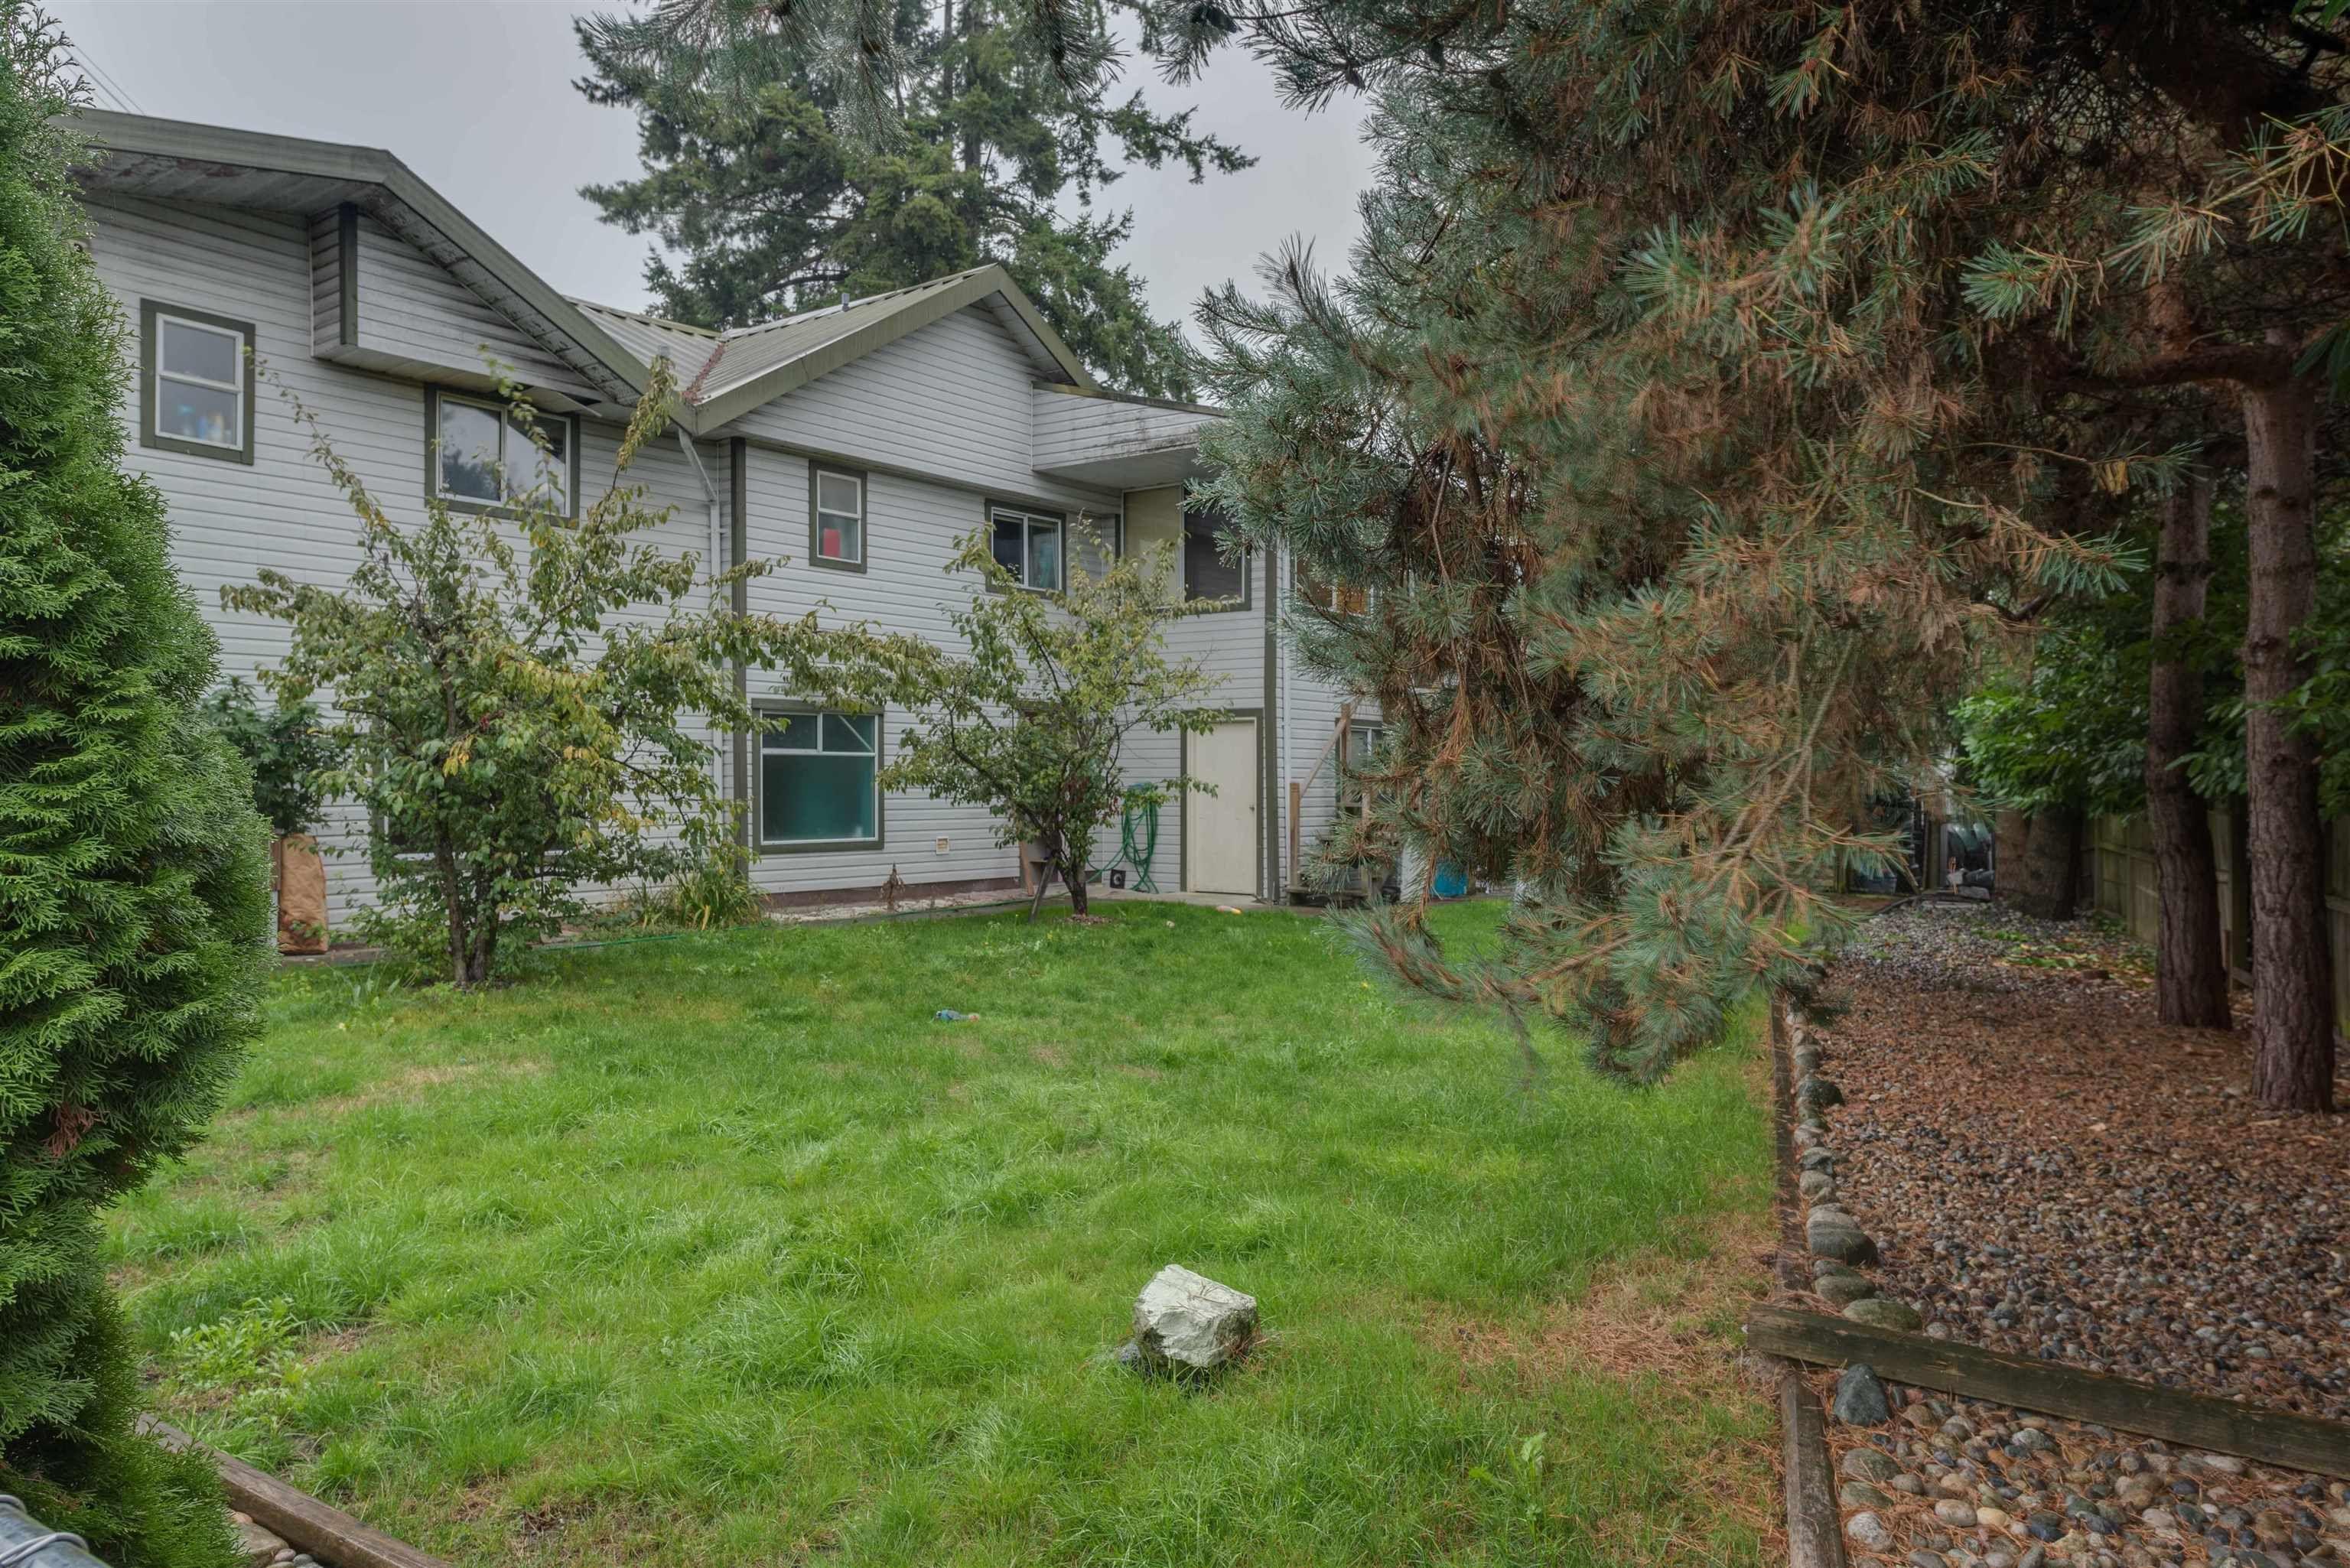 Main Photo: 6129 126 Street in Surrey: Panorama Ridge House for sale : MLS®# R2621449